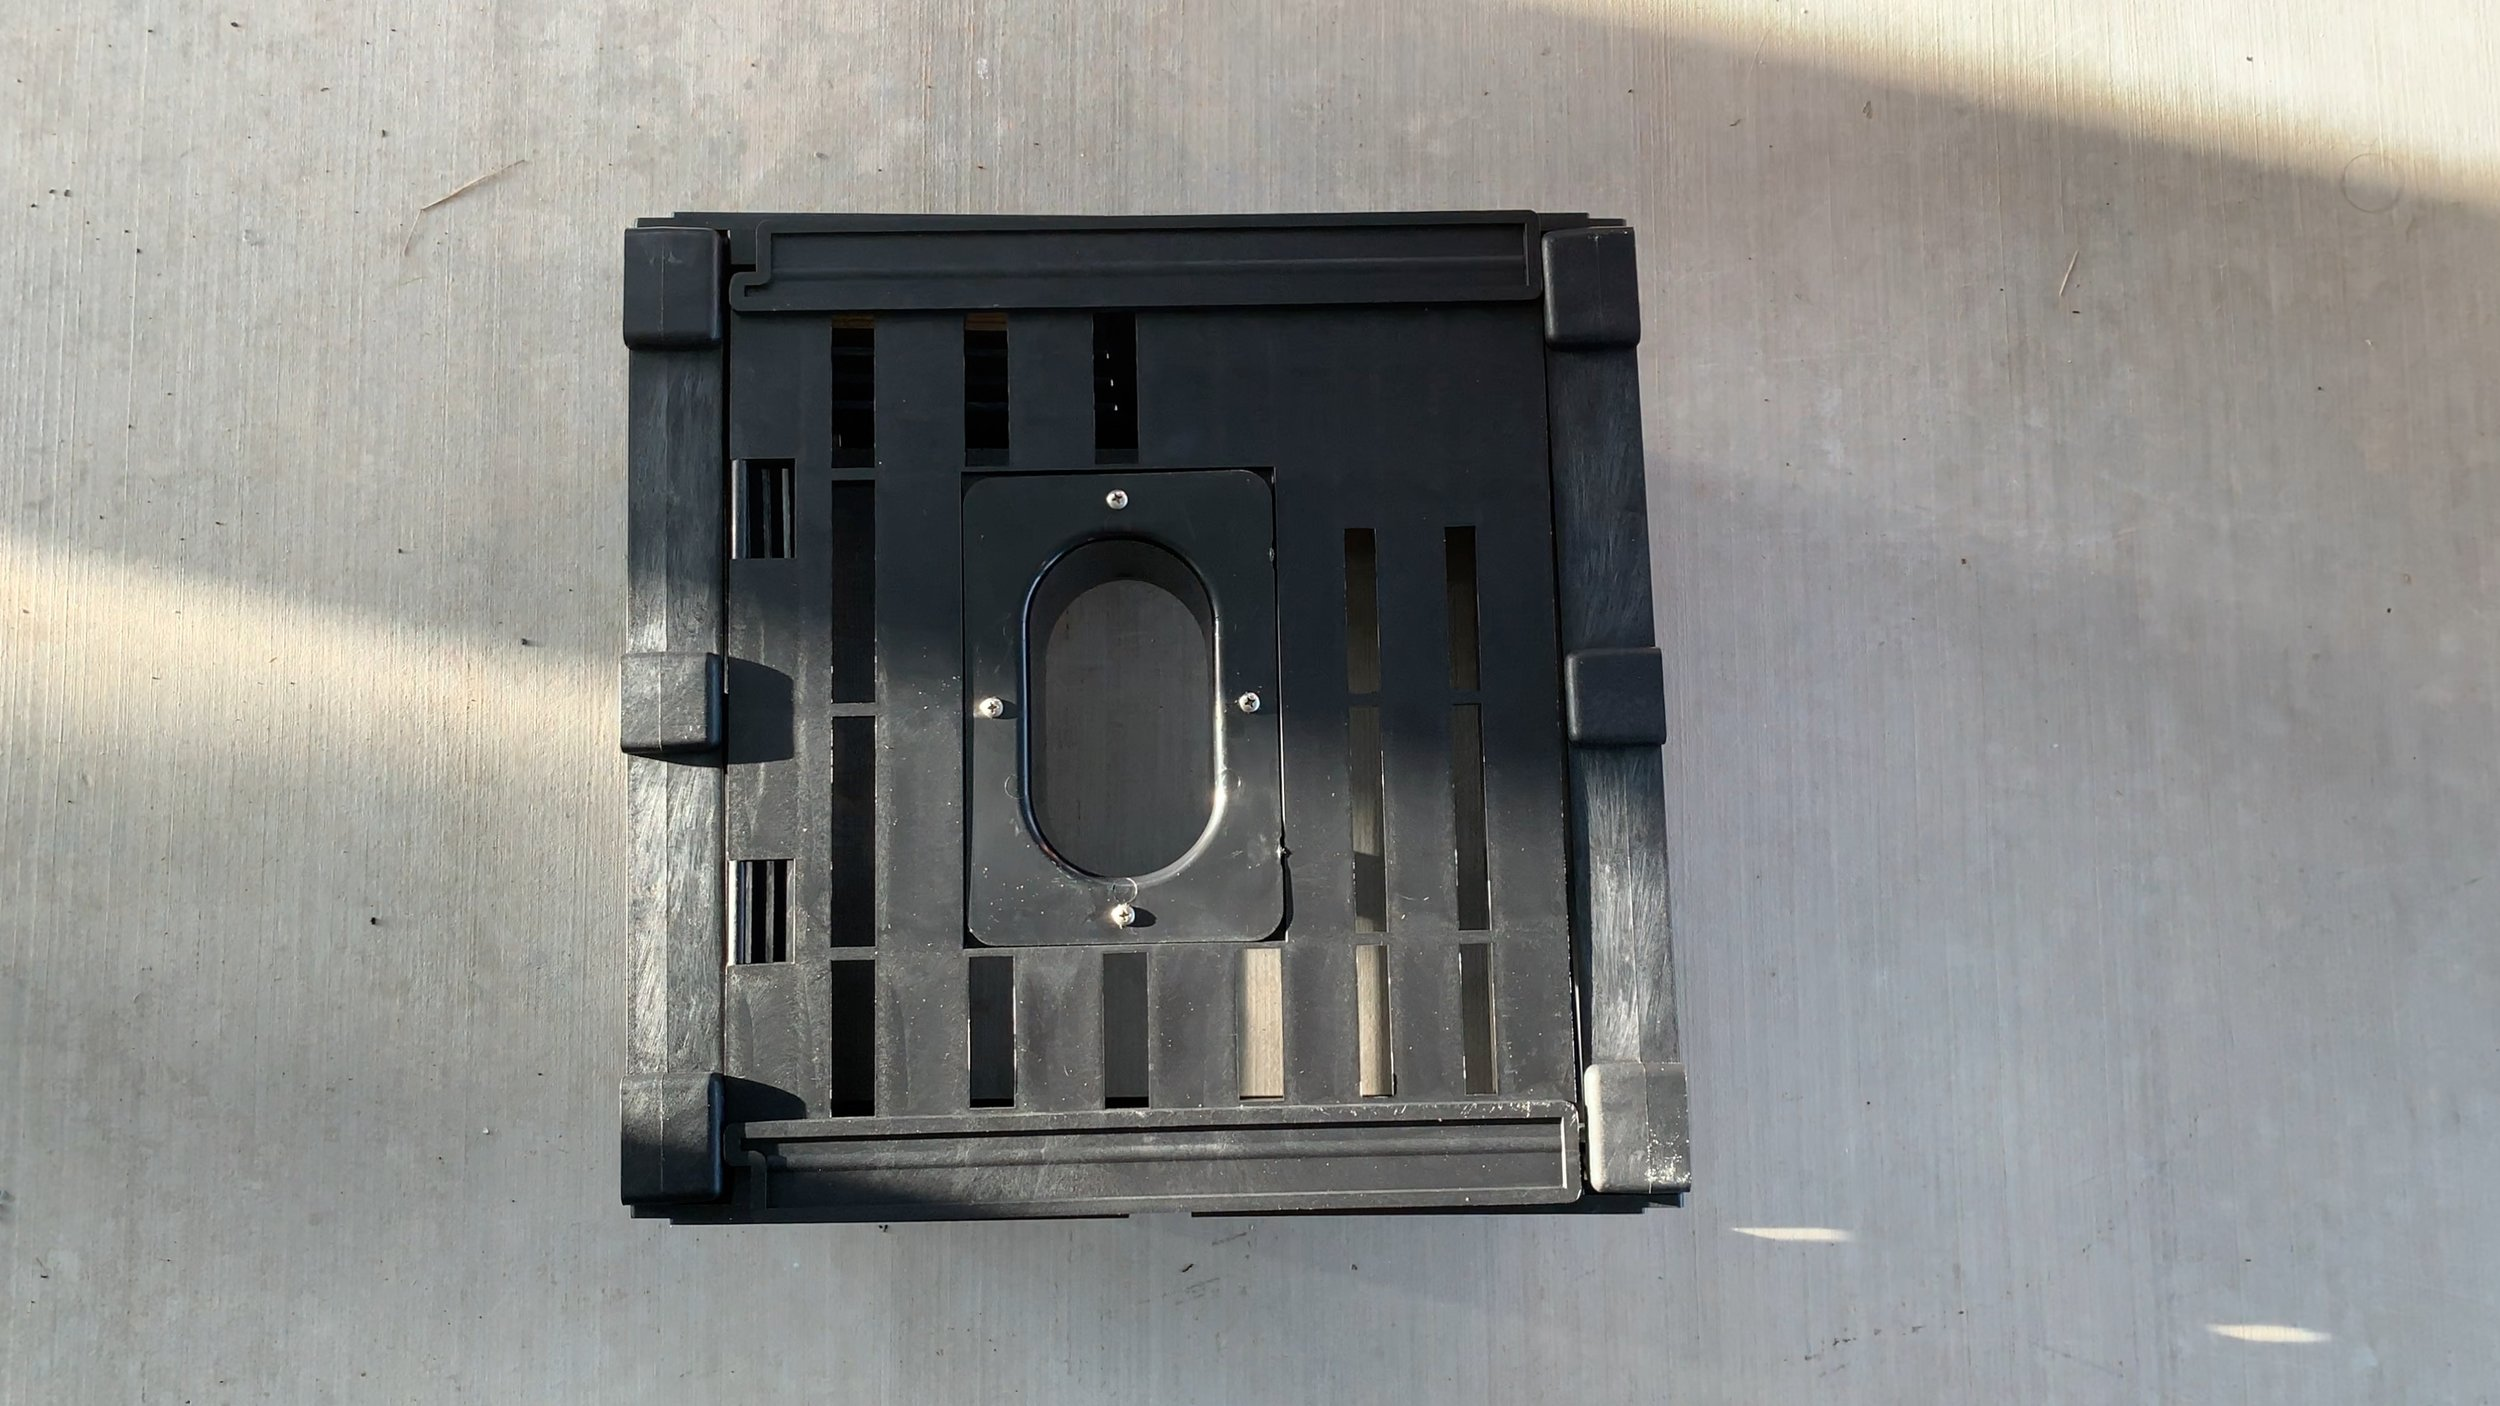 Building traps images 5.jpg